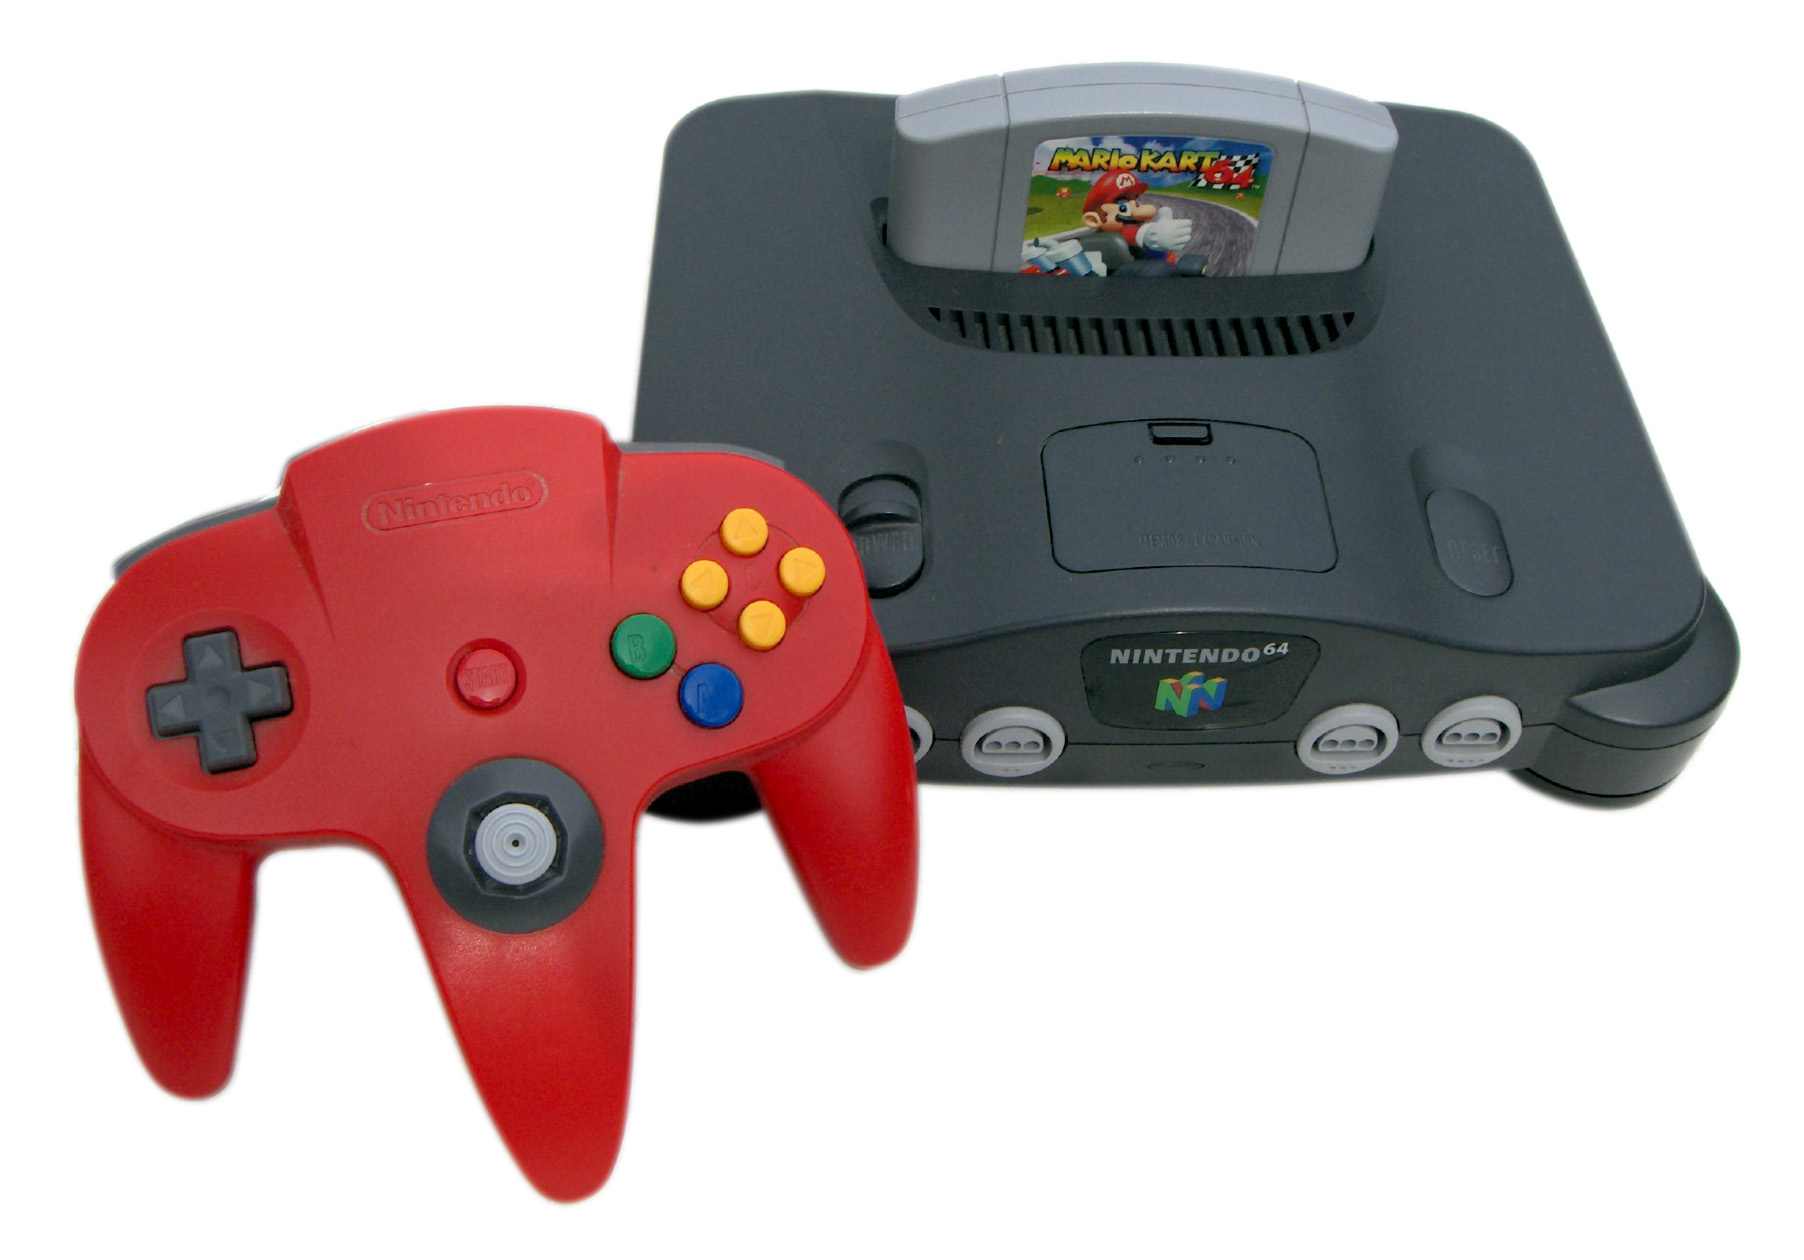 Versio Alpha de l'emulador de Nintendo 64